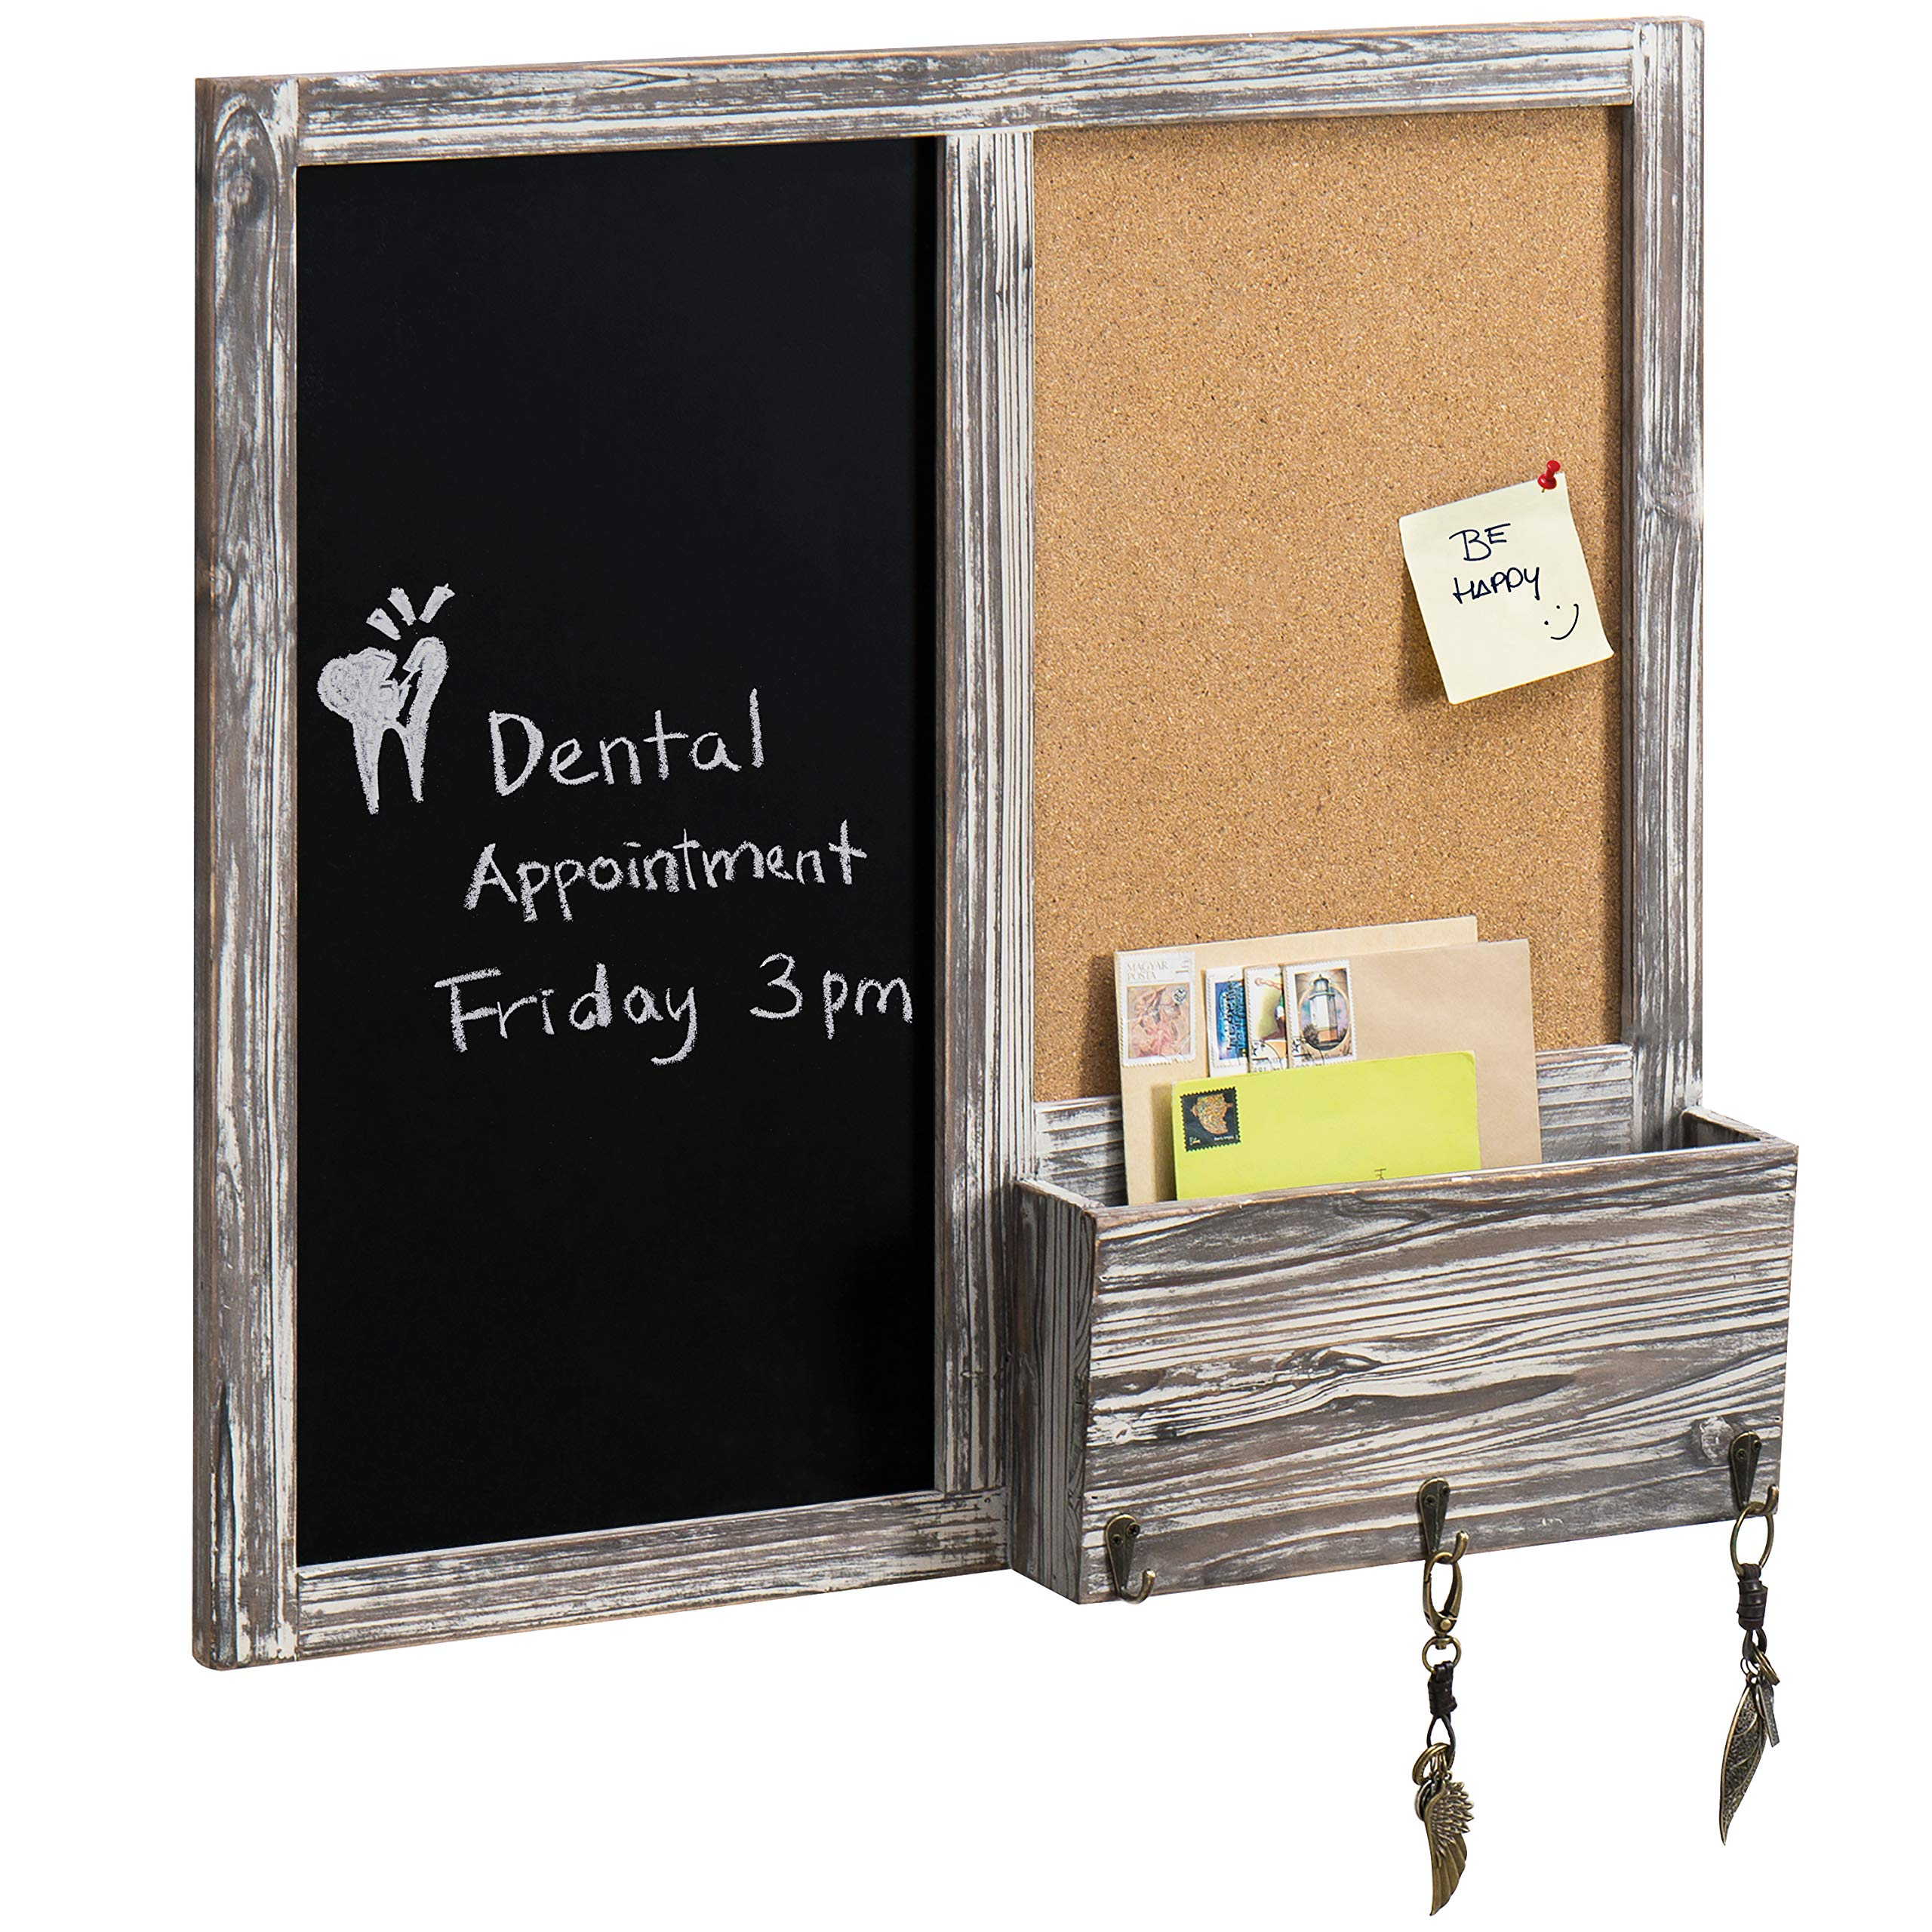 MyGift Torched Wood Wall Mounted Chalkboard & Corkboard w/Mail Sorter & 3 Hooks by MyGift